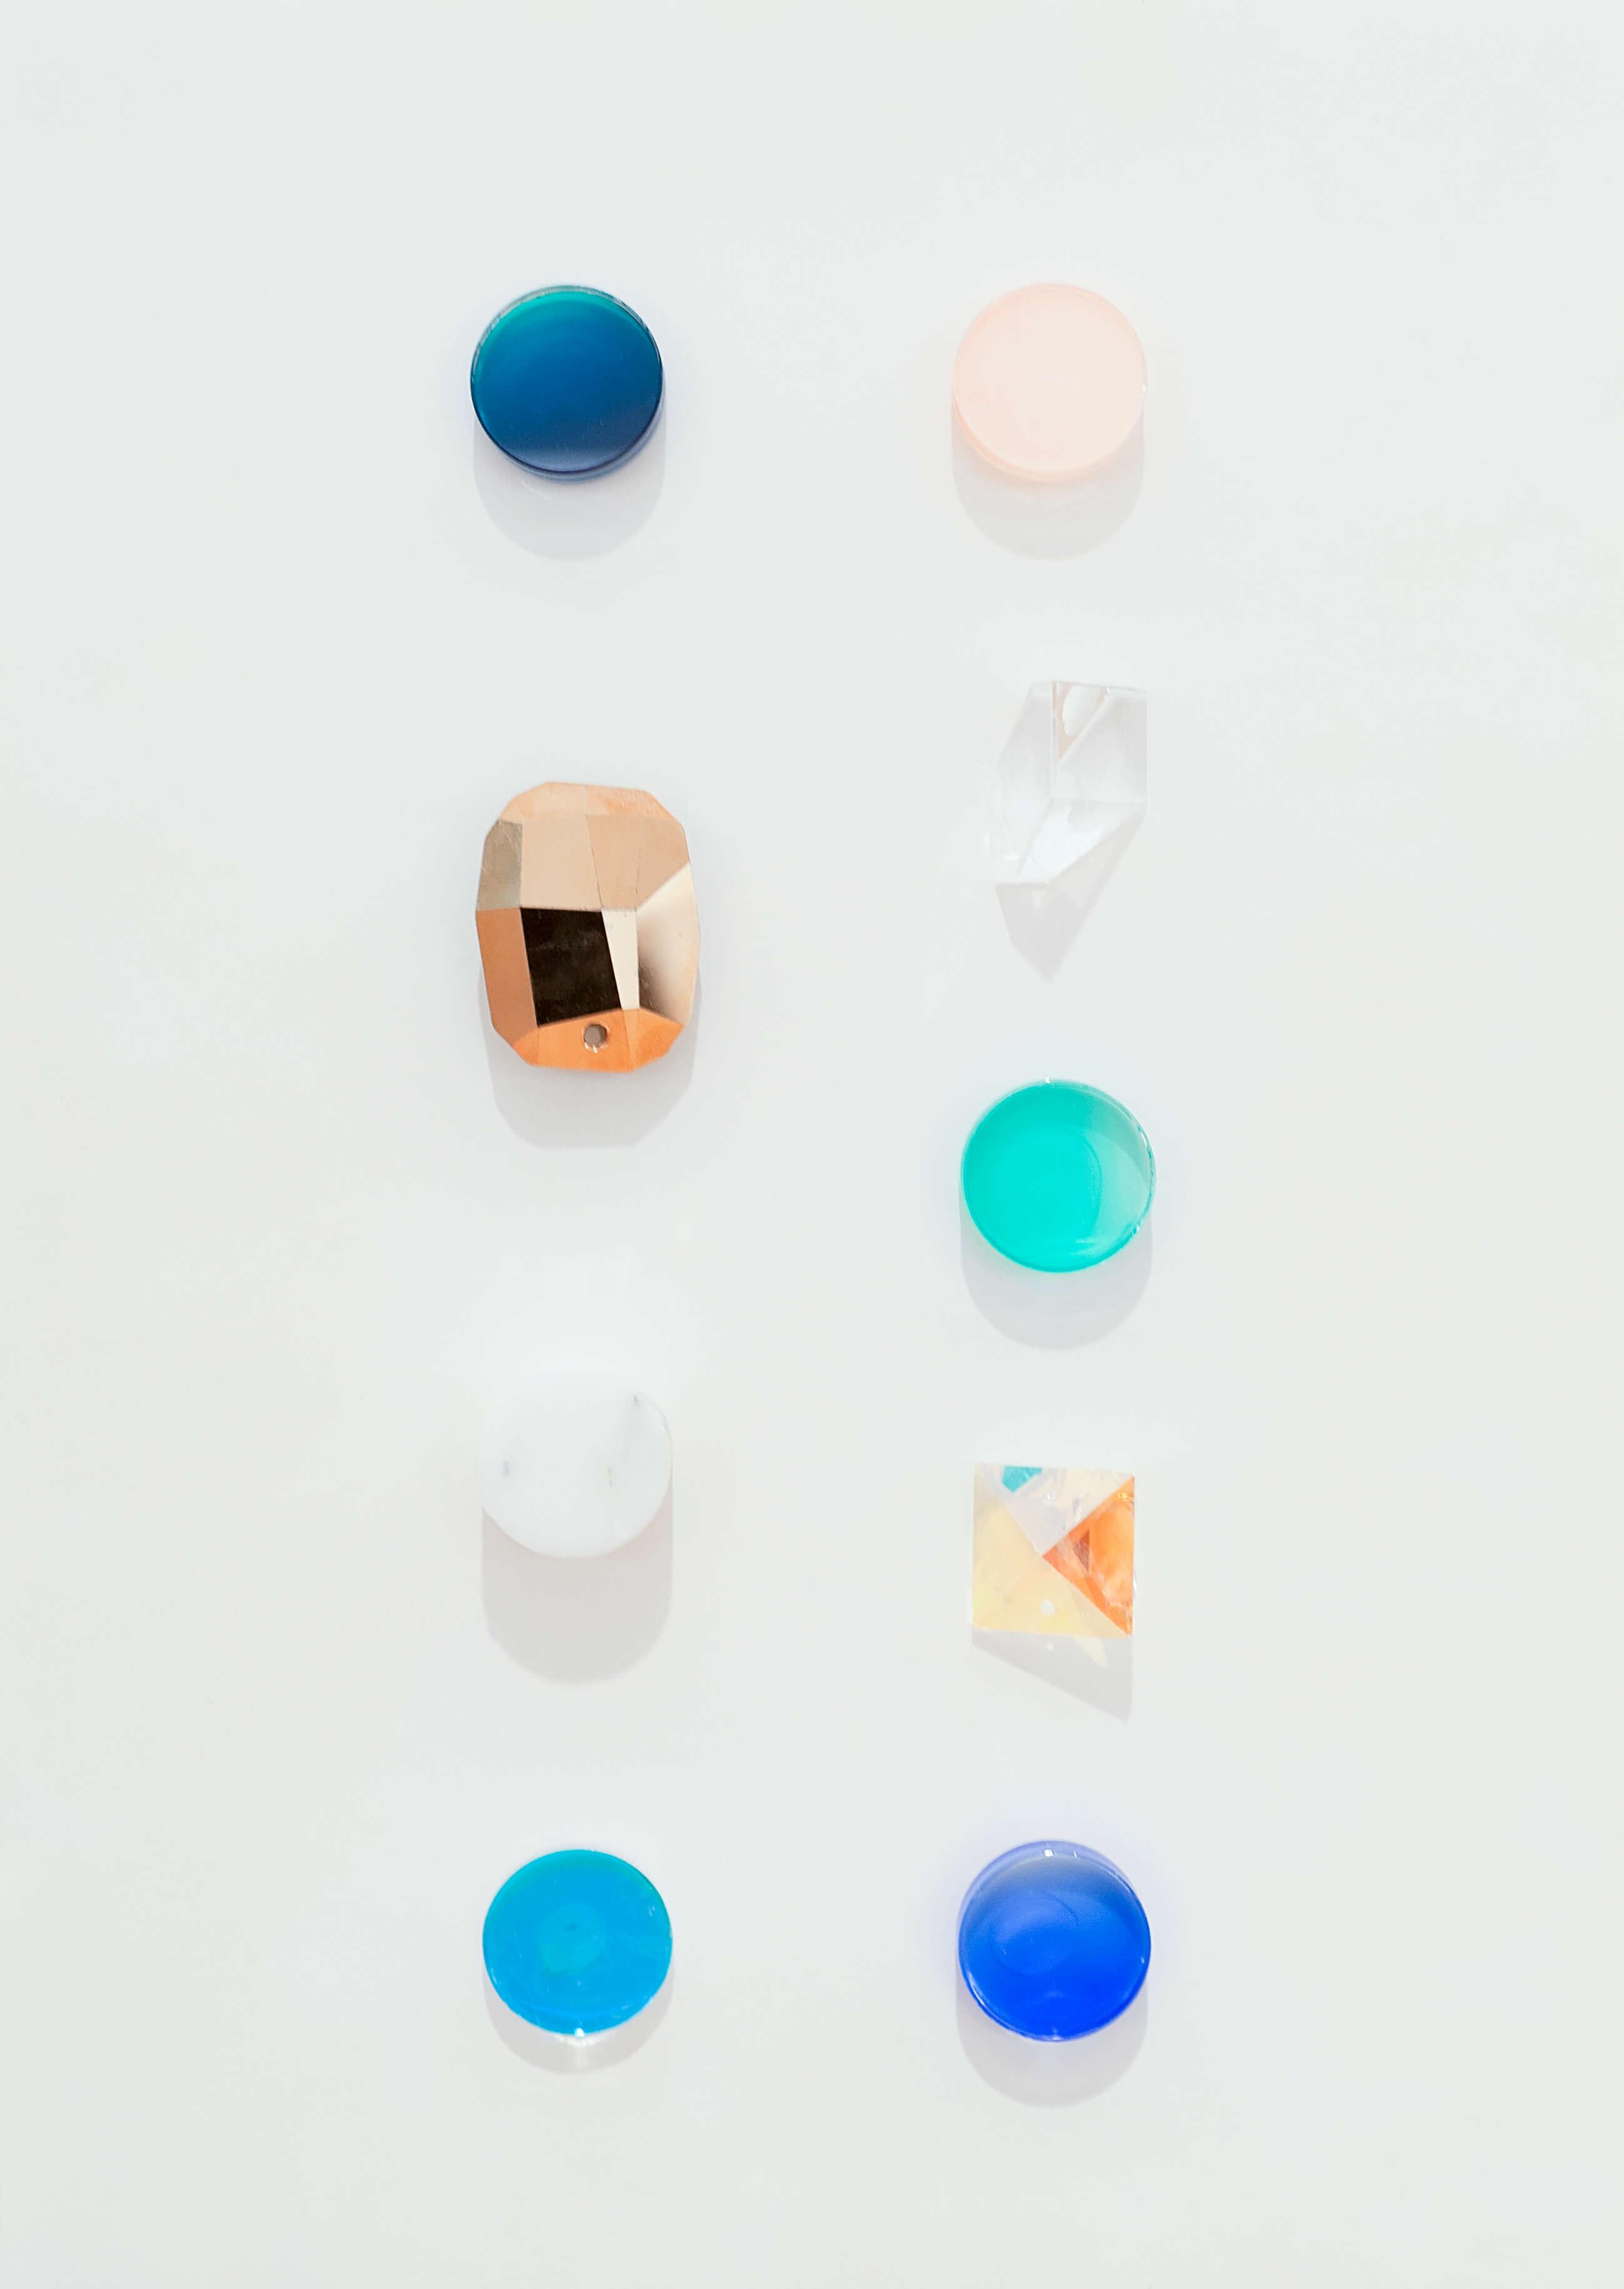 Tomás Alonso: «Pruebas, cristales Swarovski», de la serie Prism—jarrón, bandeja plana, circular & rectangular. 2015. Atelier Swarovski, Wattens, Austria